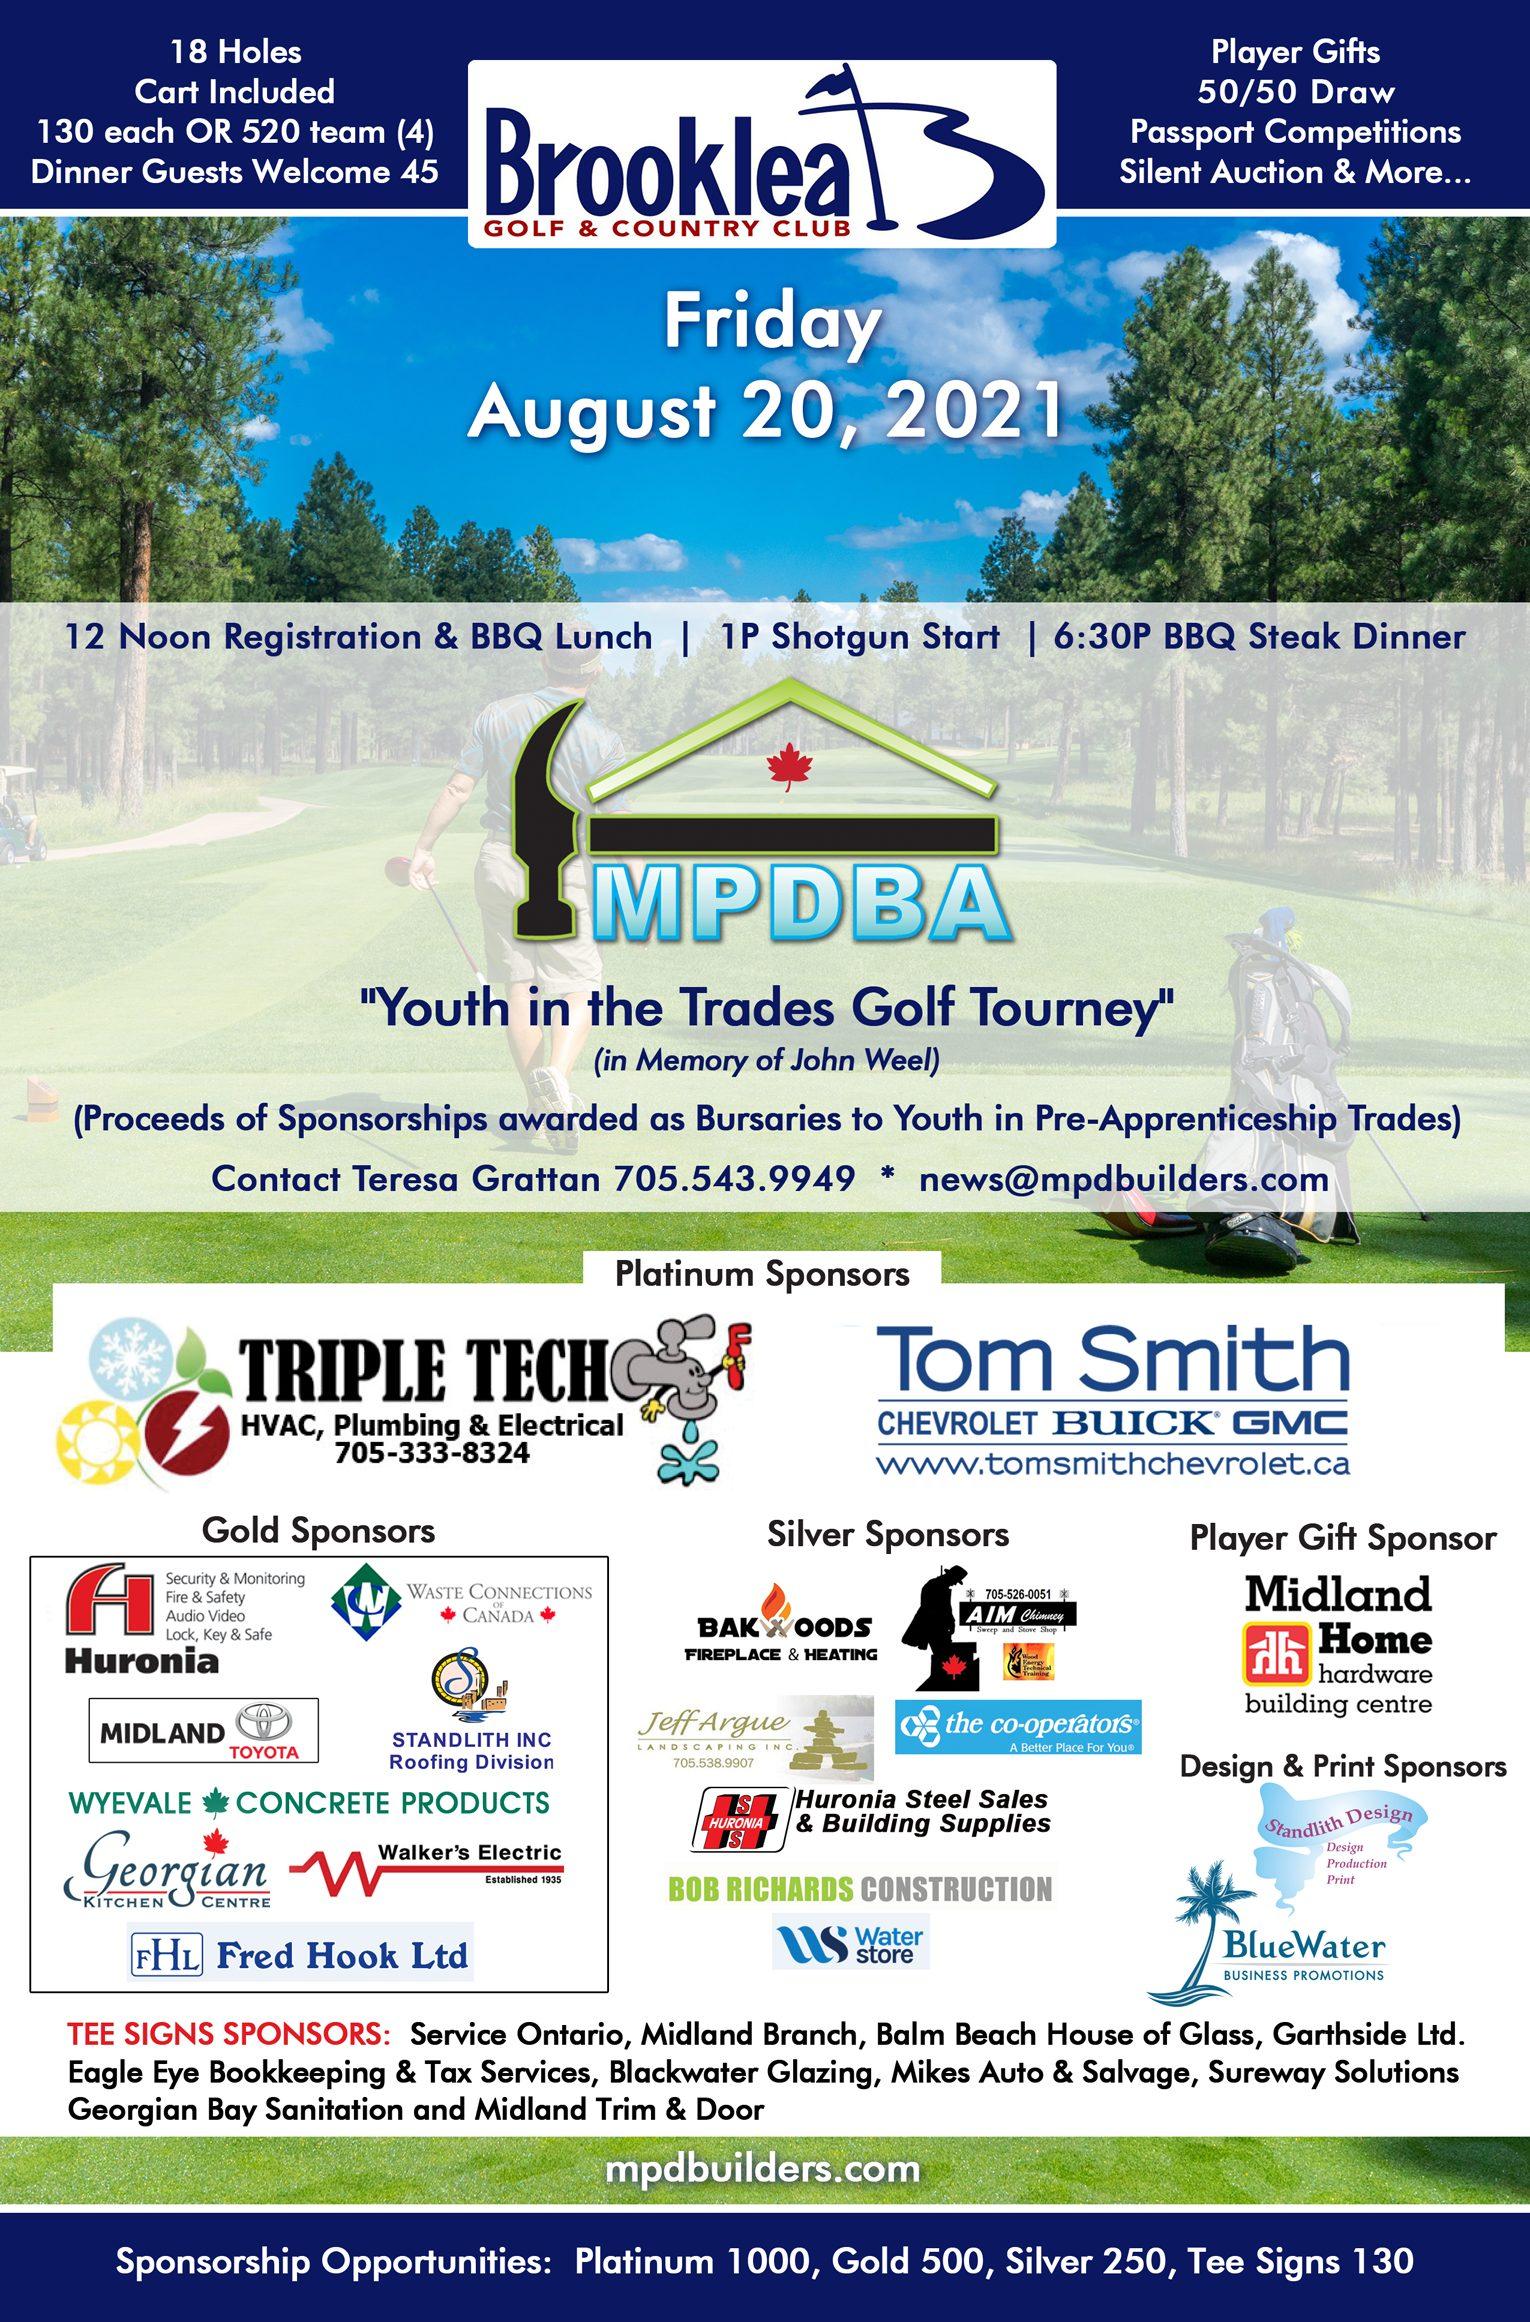 MPDBA 2021 Gulf Tournament